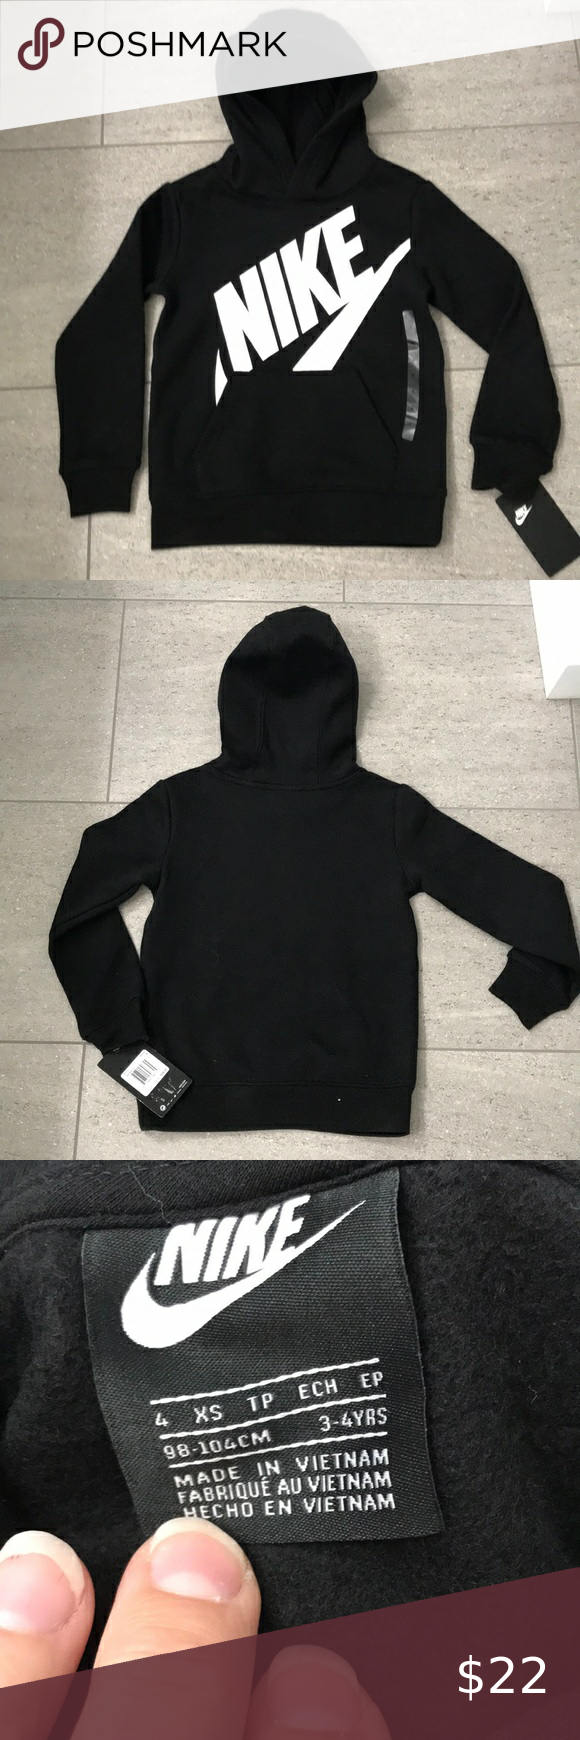 Nike Sweatshirt Nike Sweatshirts Clothes Design Nike Shirts [ 1740 x 580 Pixel ]